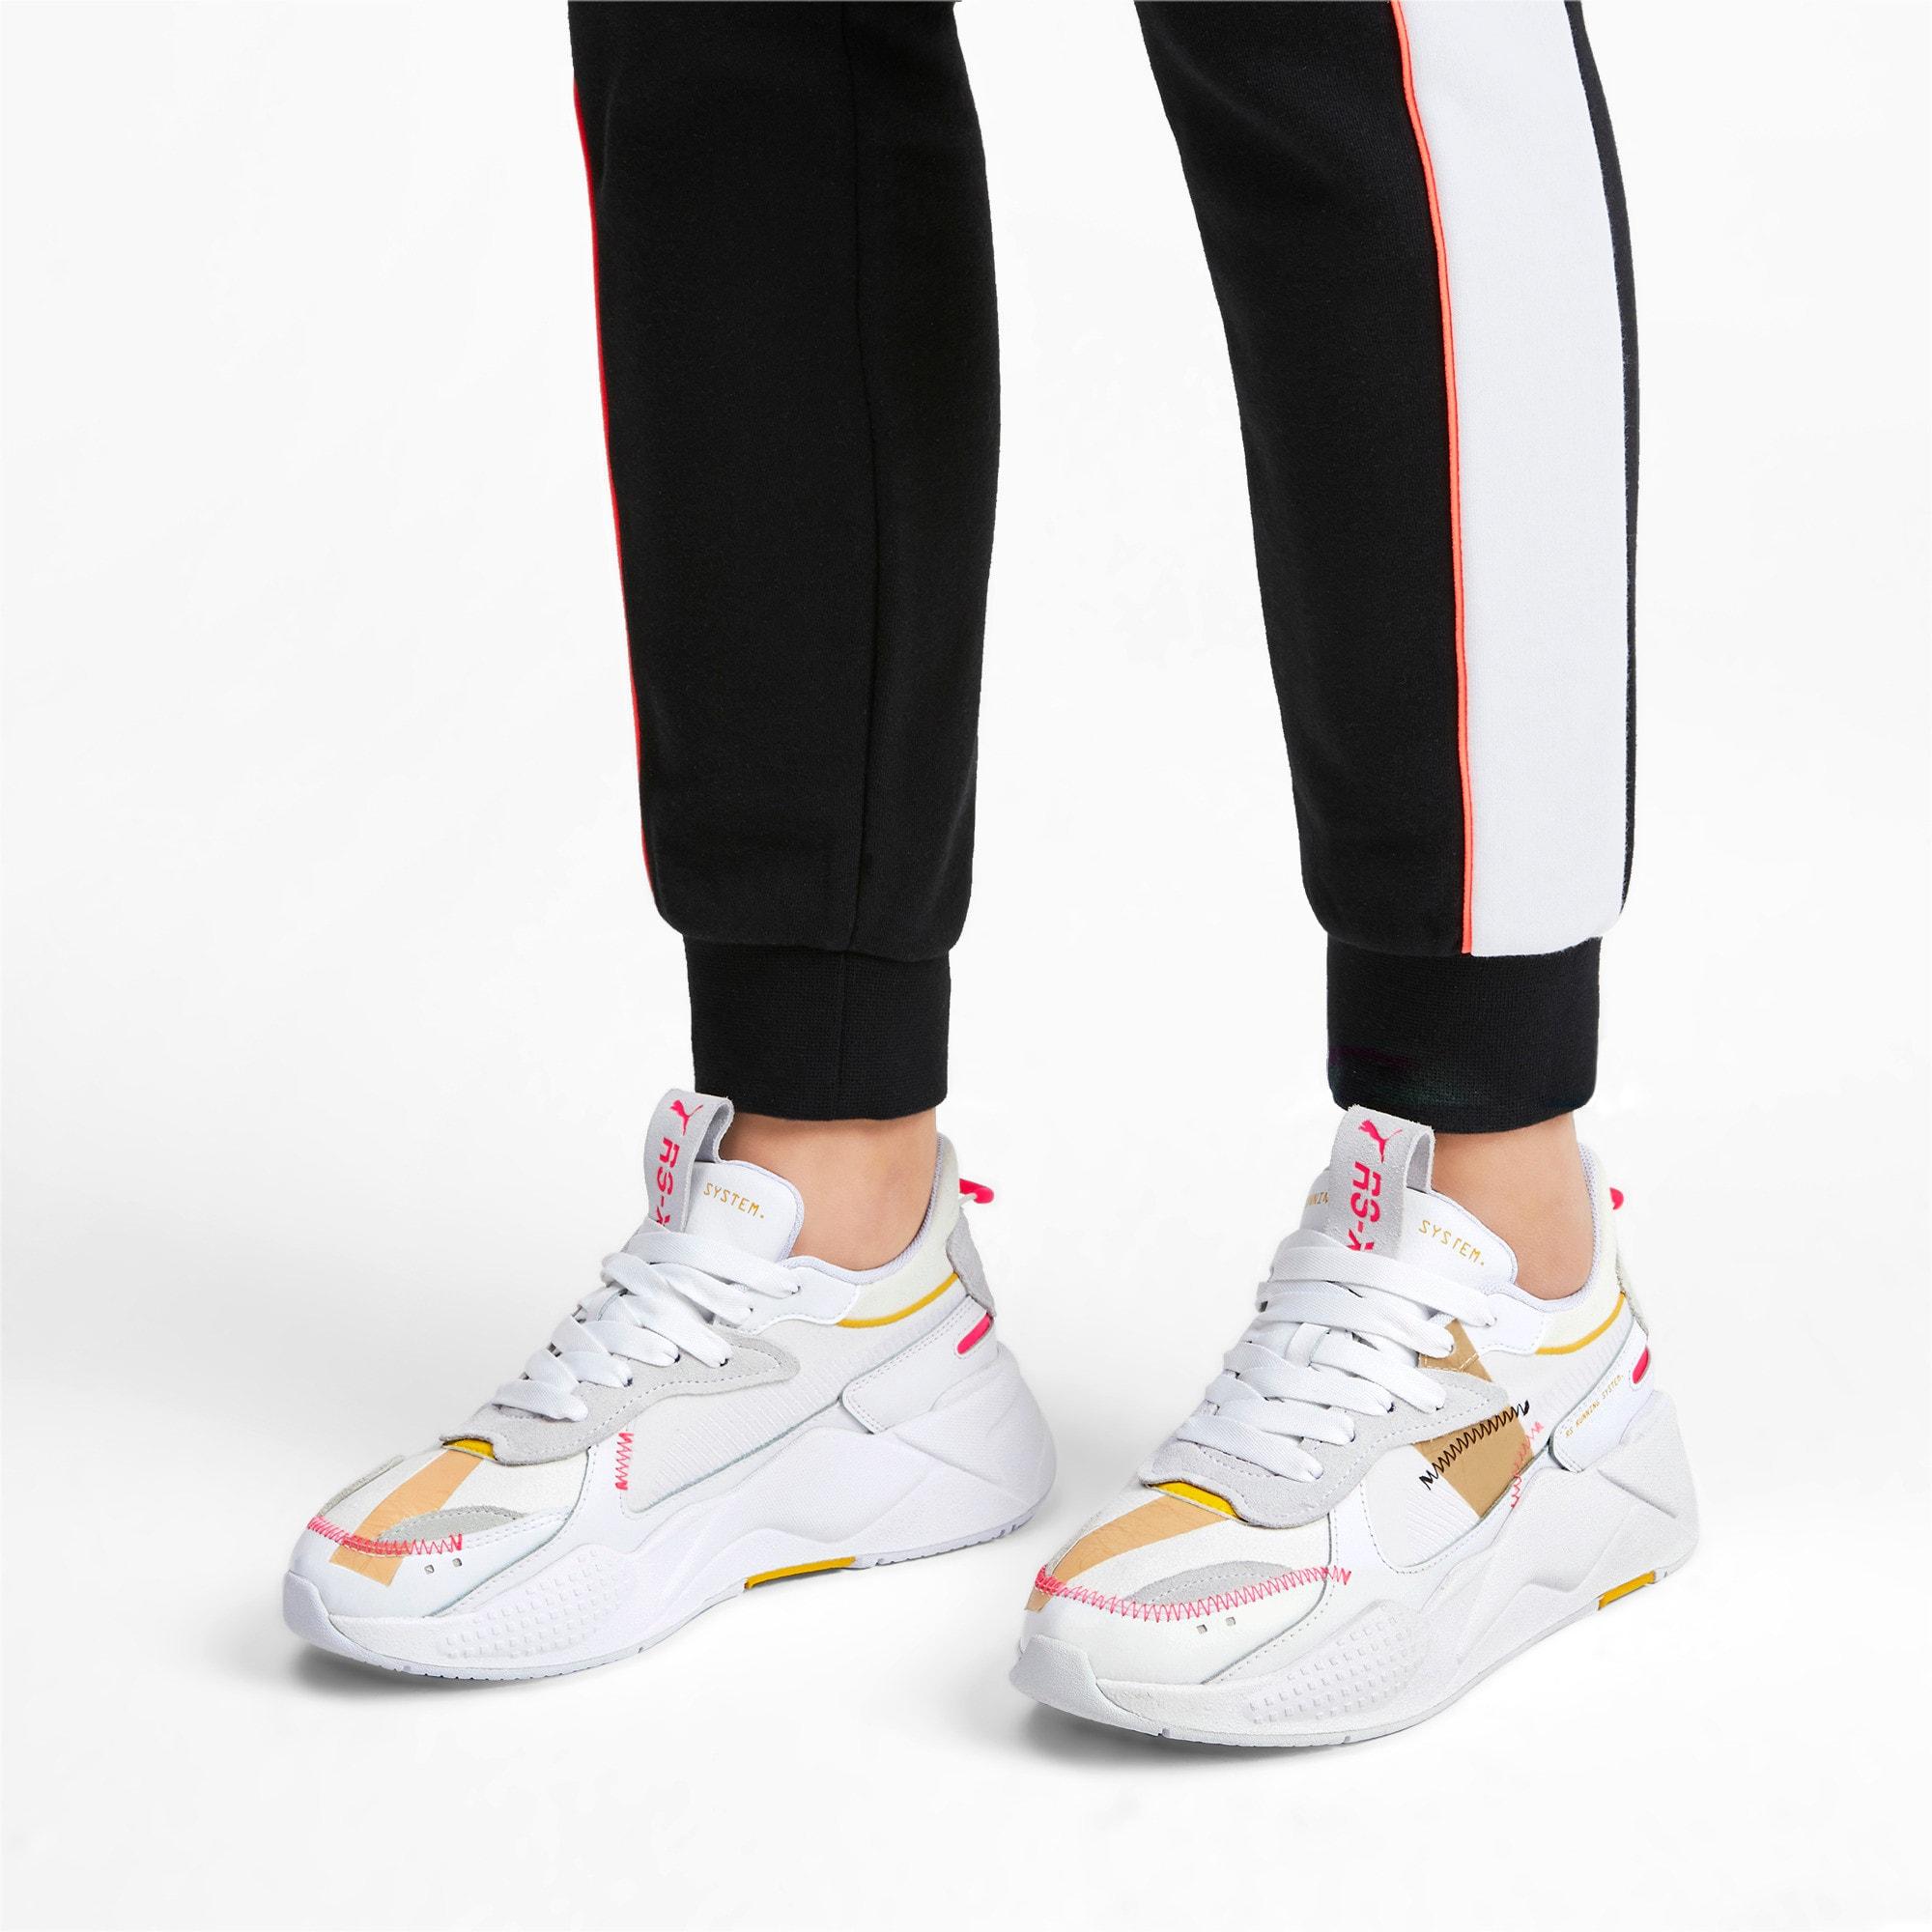 Thumbnail 2 of RS-X Proto Women's Trainers, Puma White, medium